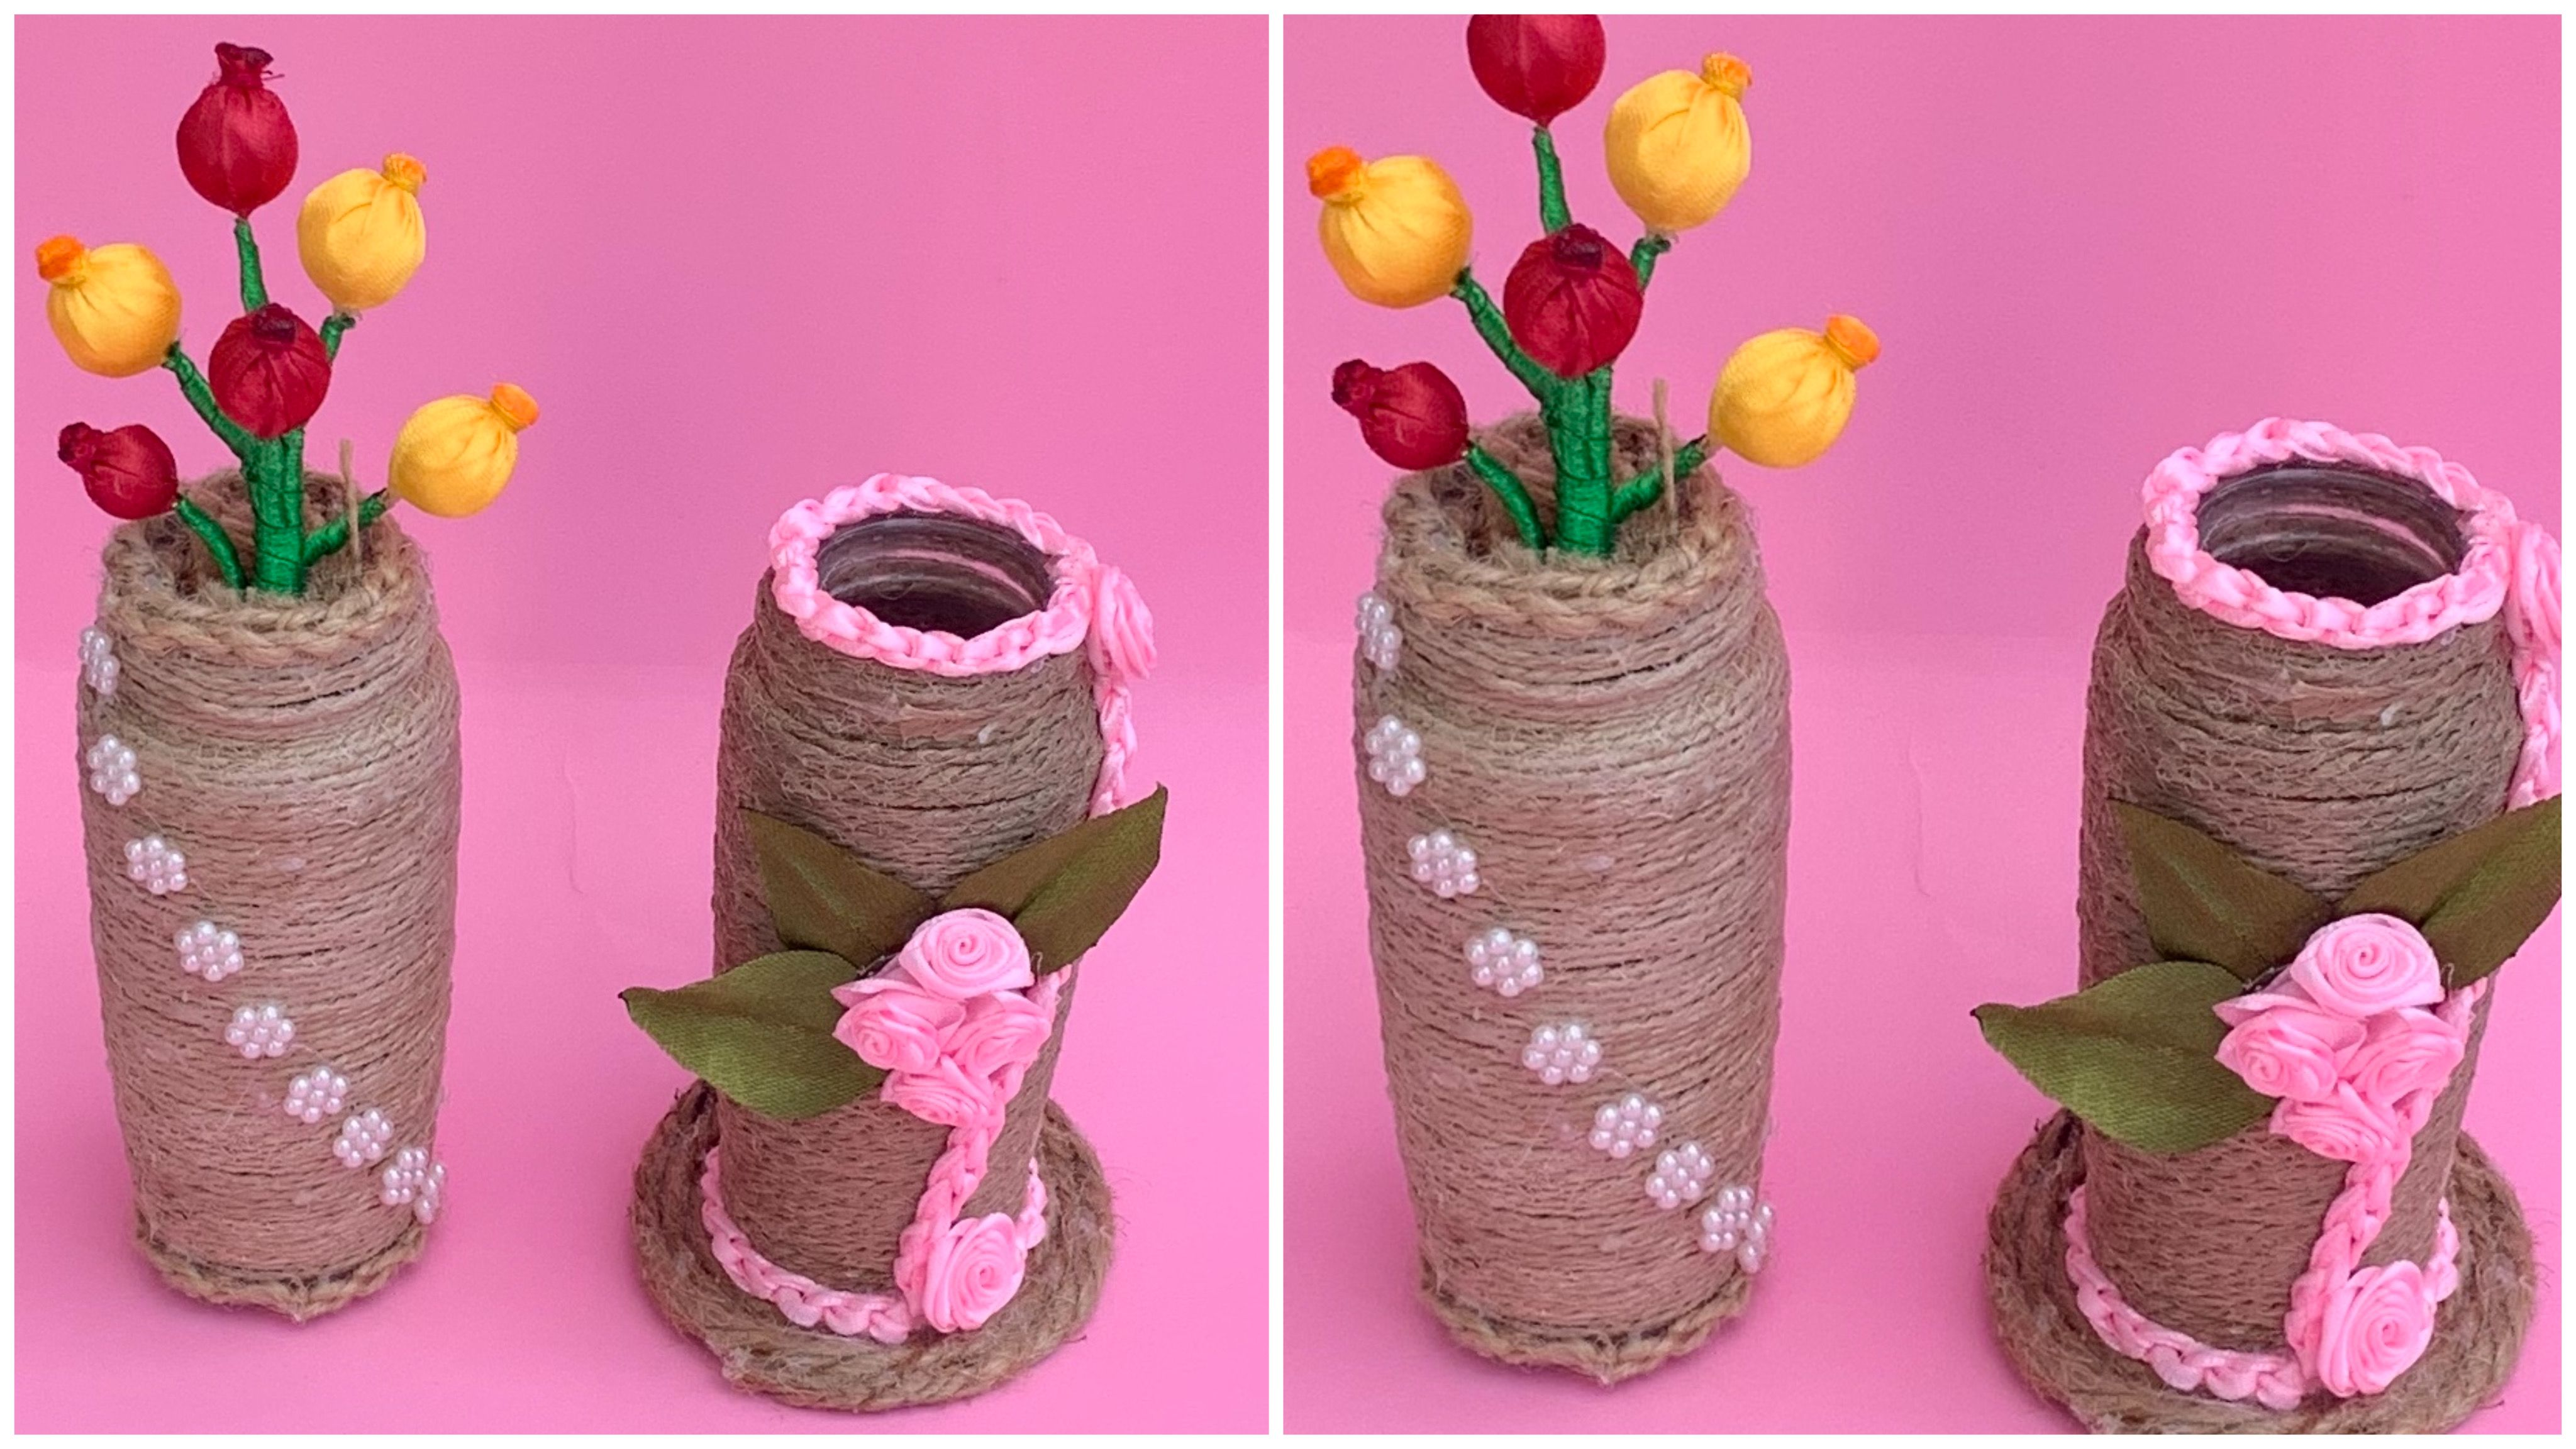 Handmade Flower Vase Step By Step How To Make A Vase With Jute Ribbon Flower Vase Diy Flower Vase Making Handmade Flowers